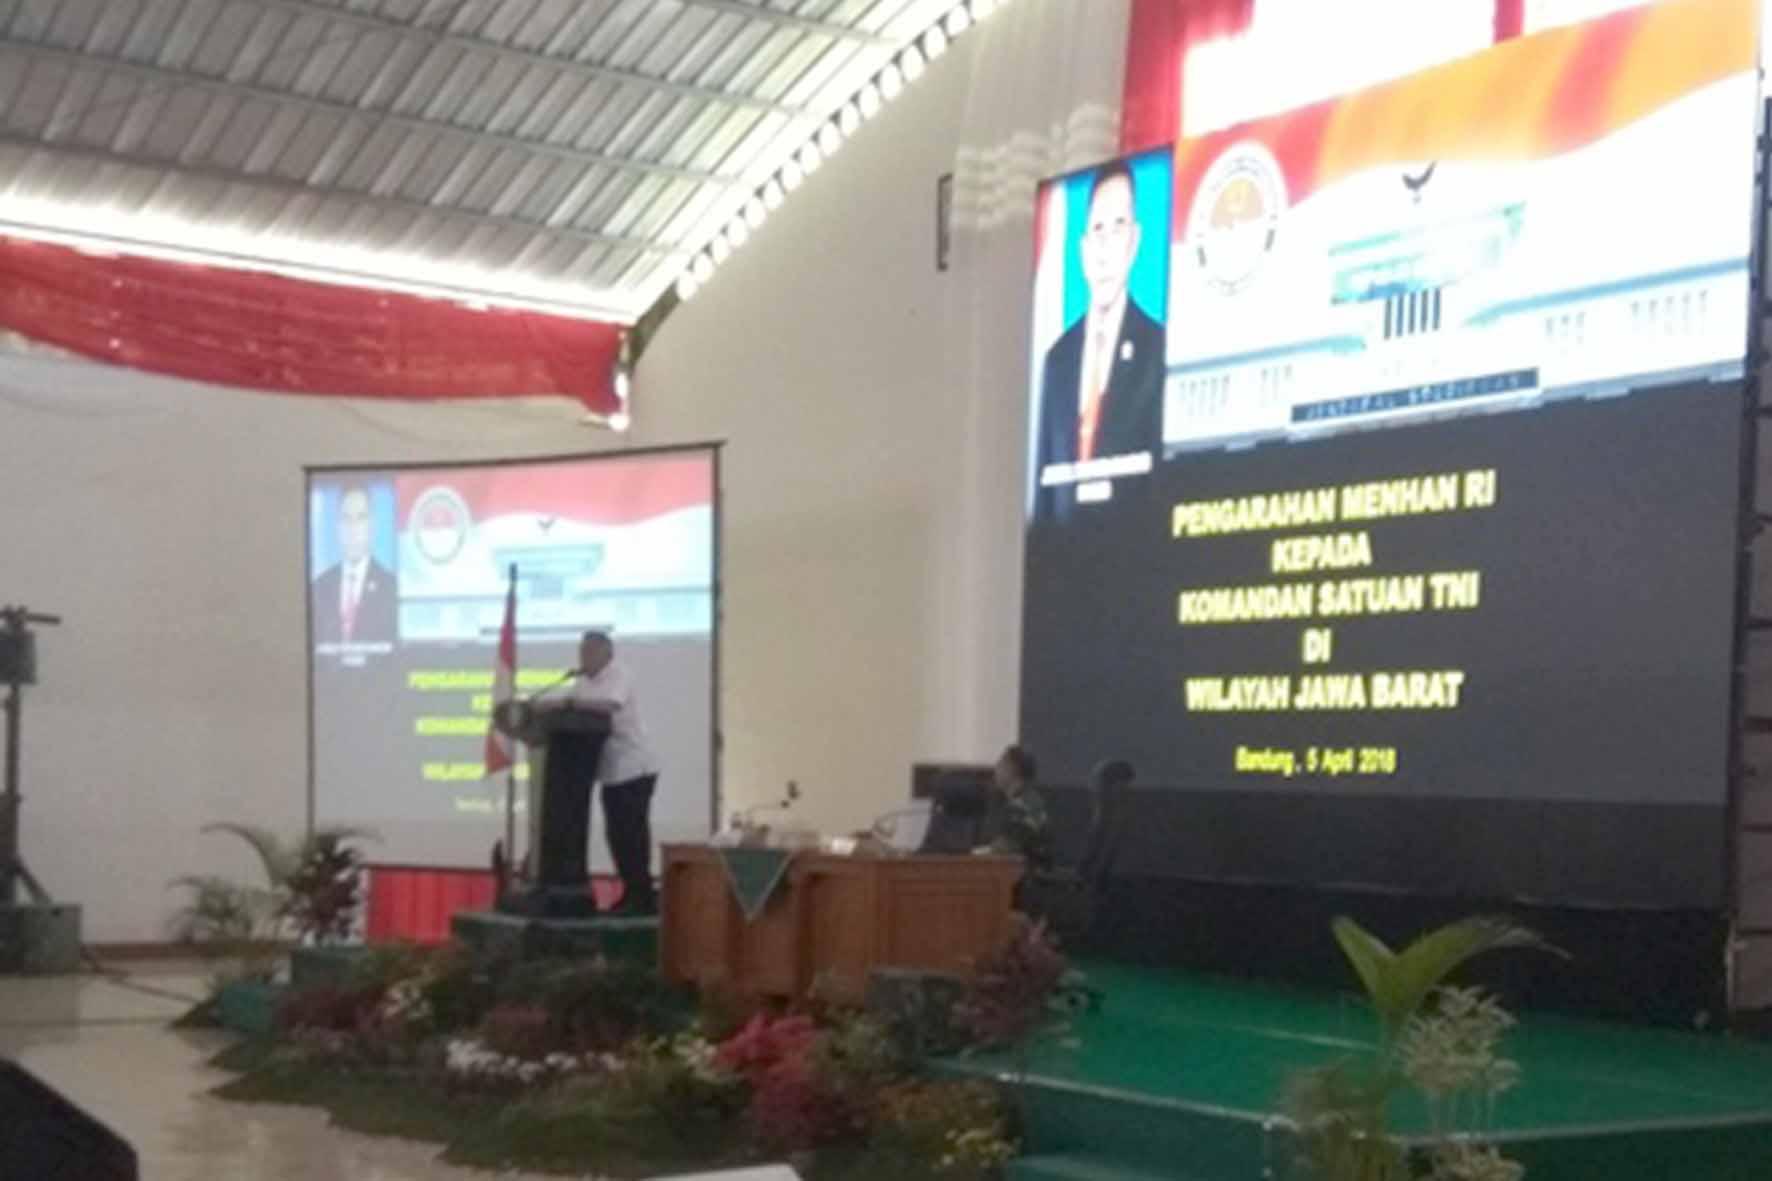 Prajurit Korpaskhas Ikuti Pengarahan Menhan RI di Bandung